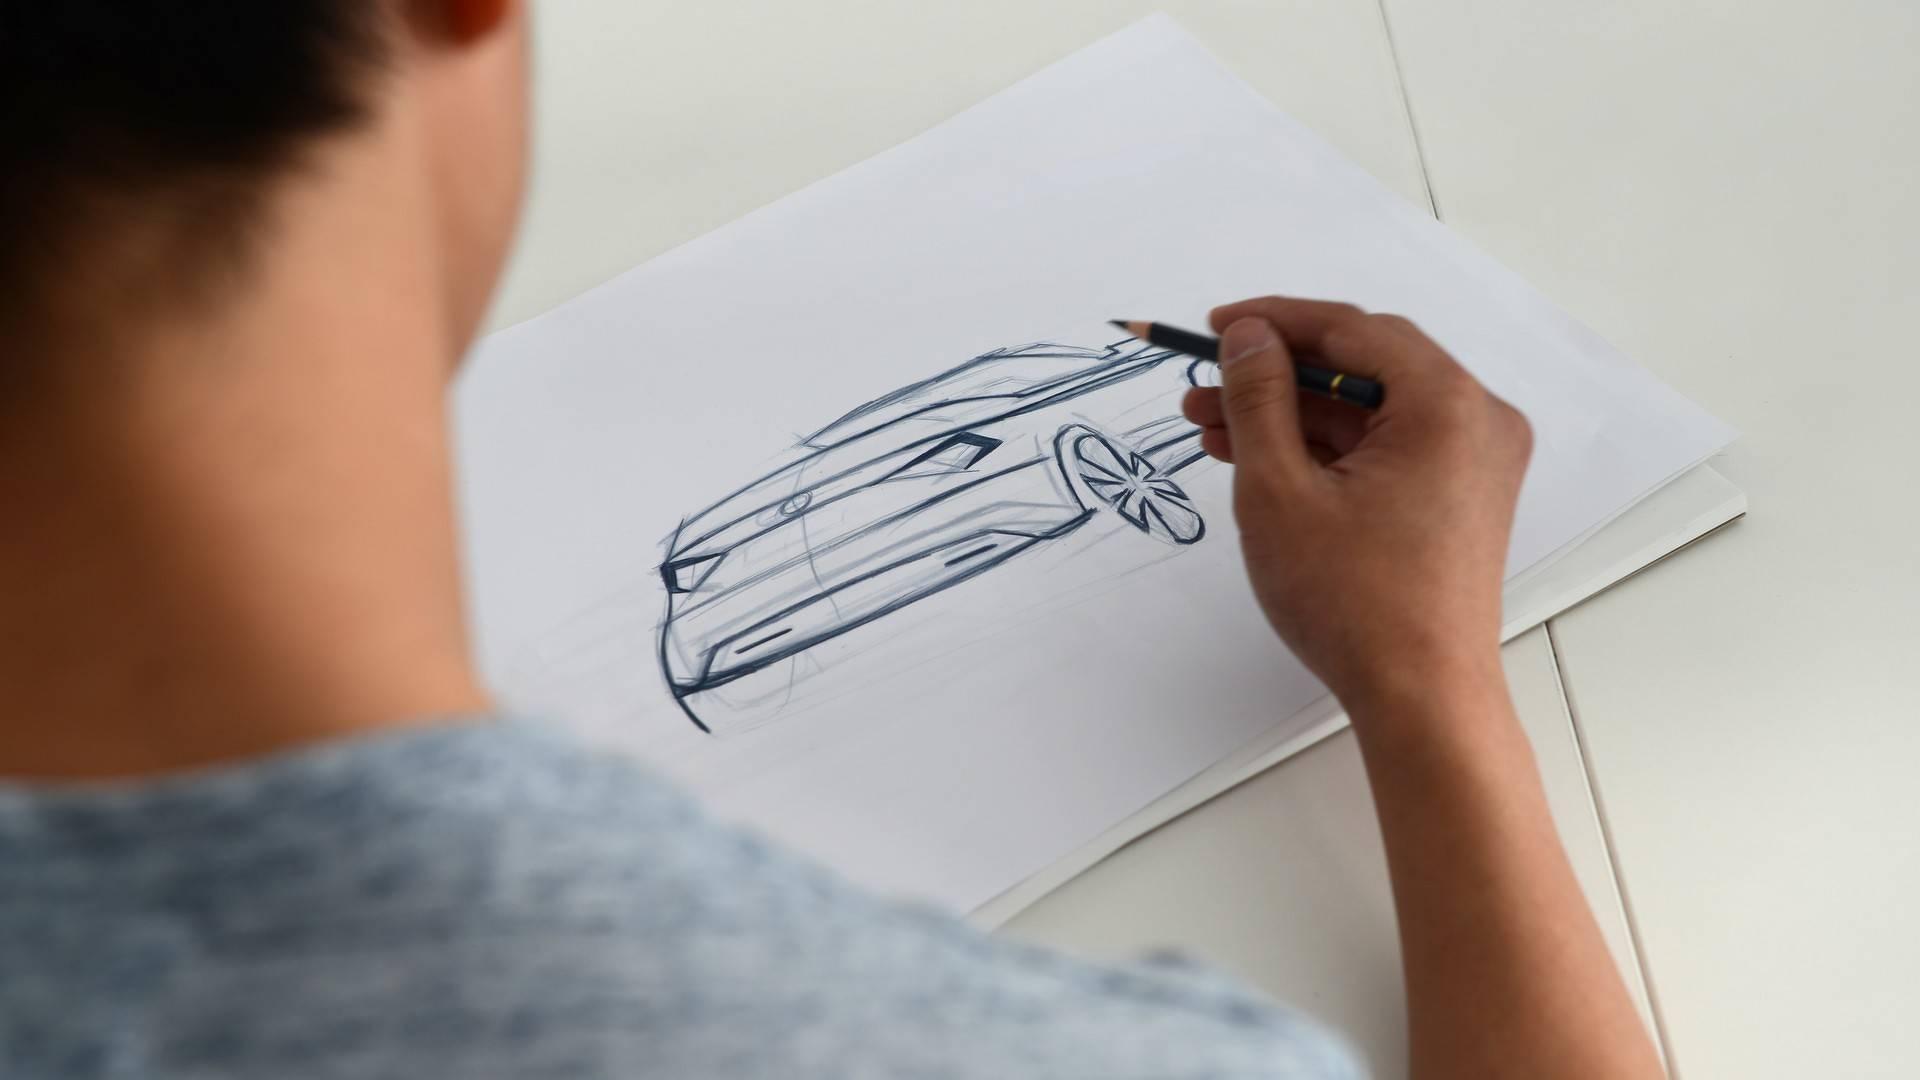 skoda-karoq-cabriolet-concept-teaser (4)